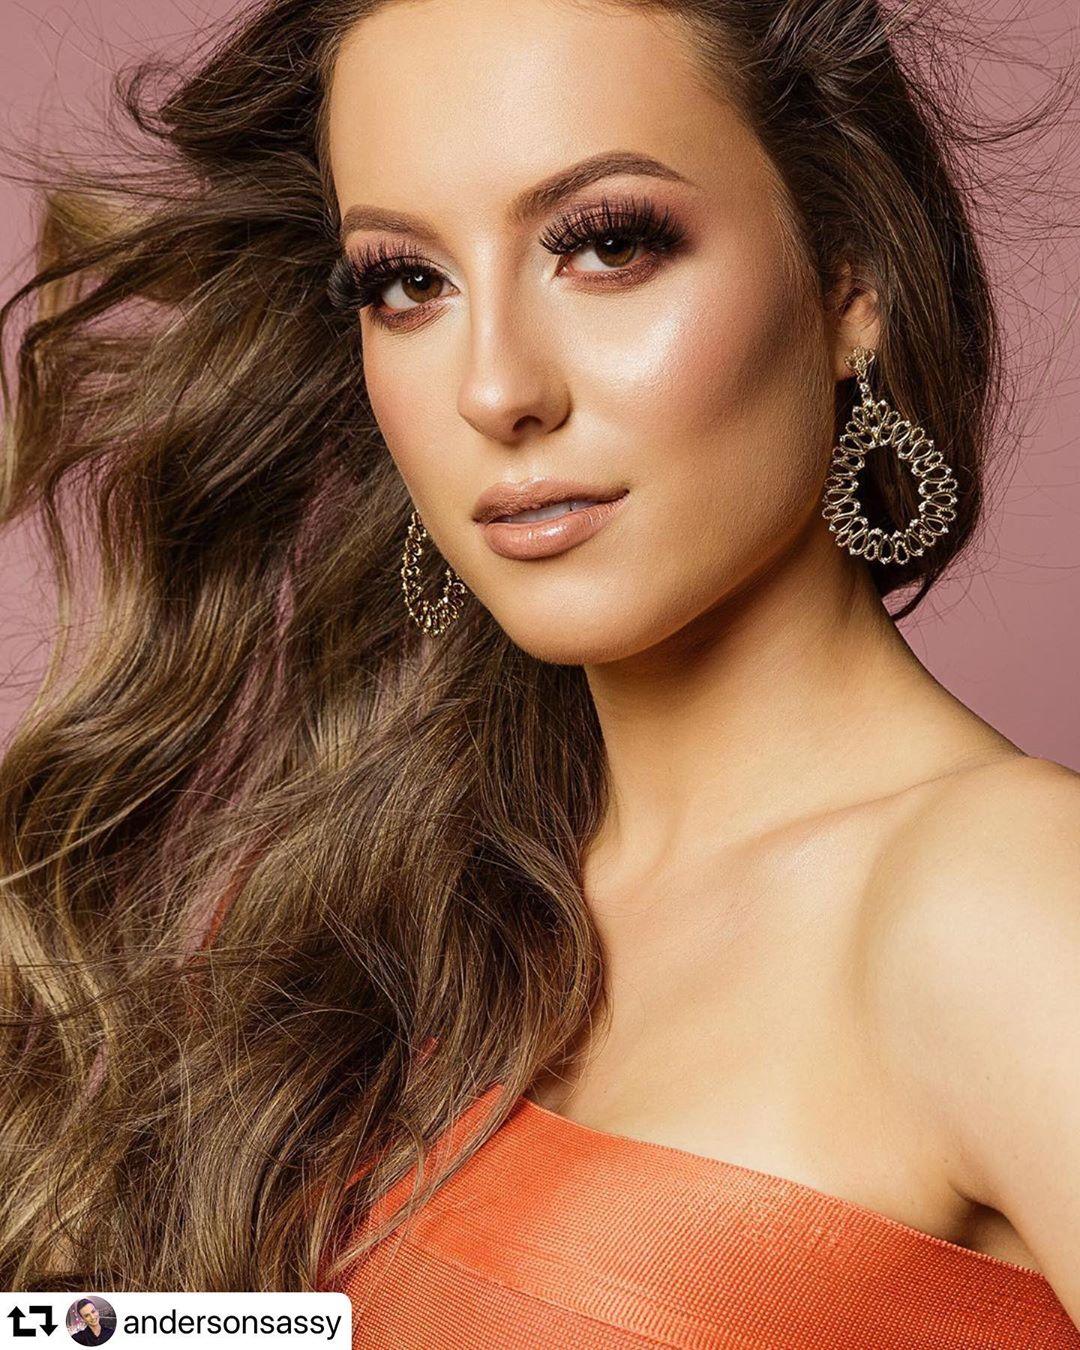 cristine boff sartor, segunda finalista de miss latinoamerica 2019. - Página 6 66674410